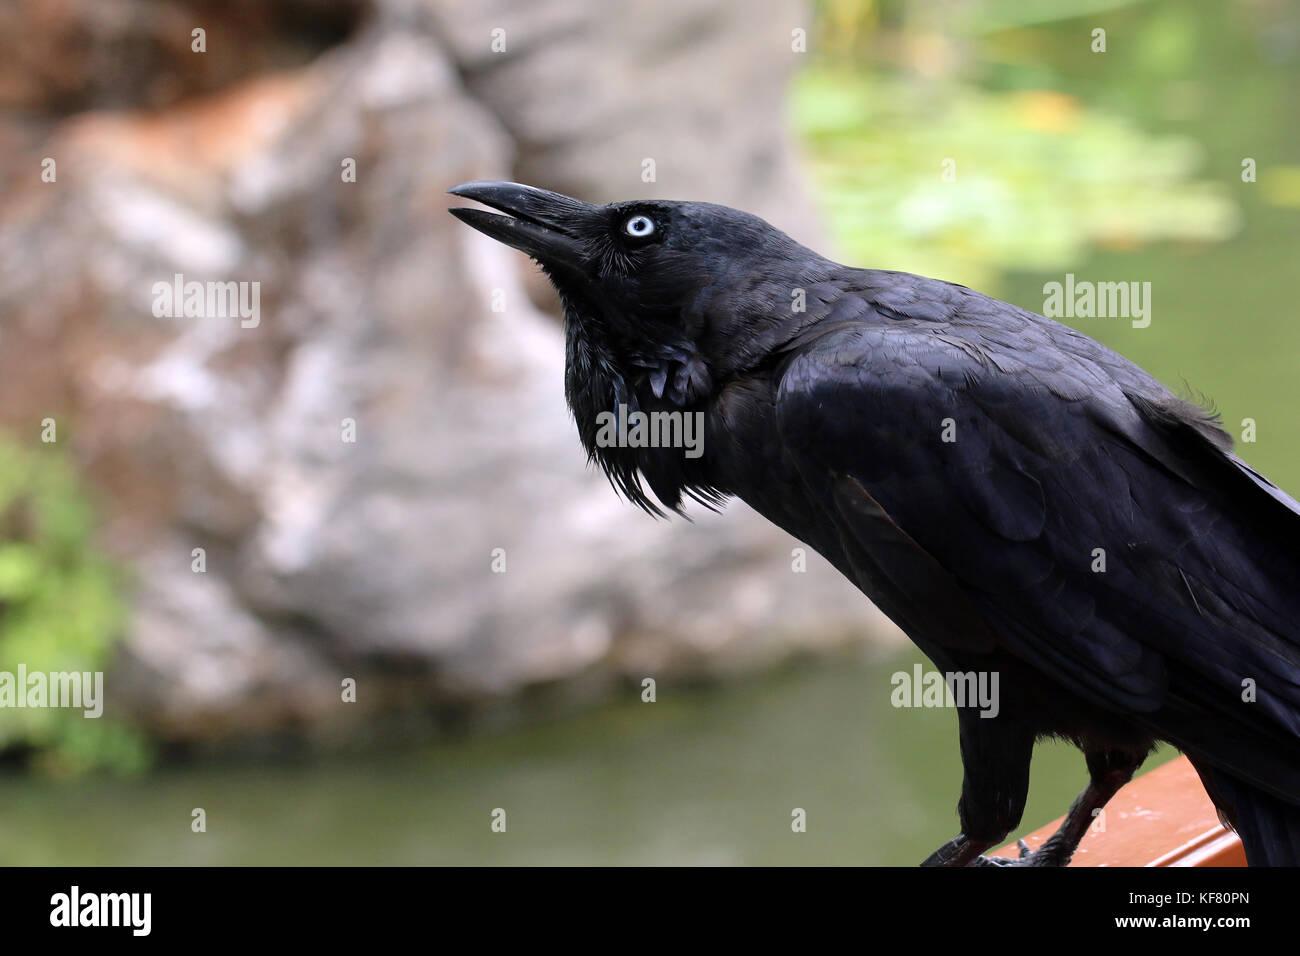 Australian raven calling - Stock Image